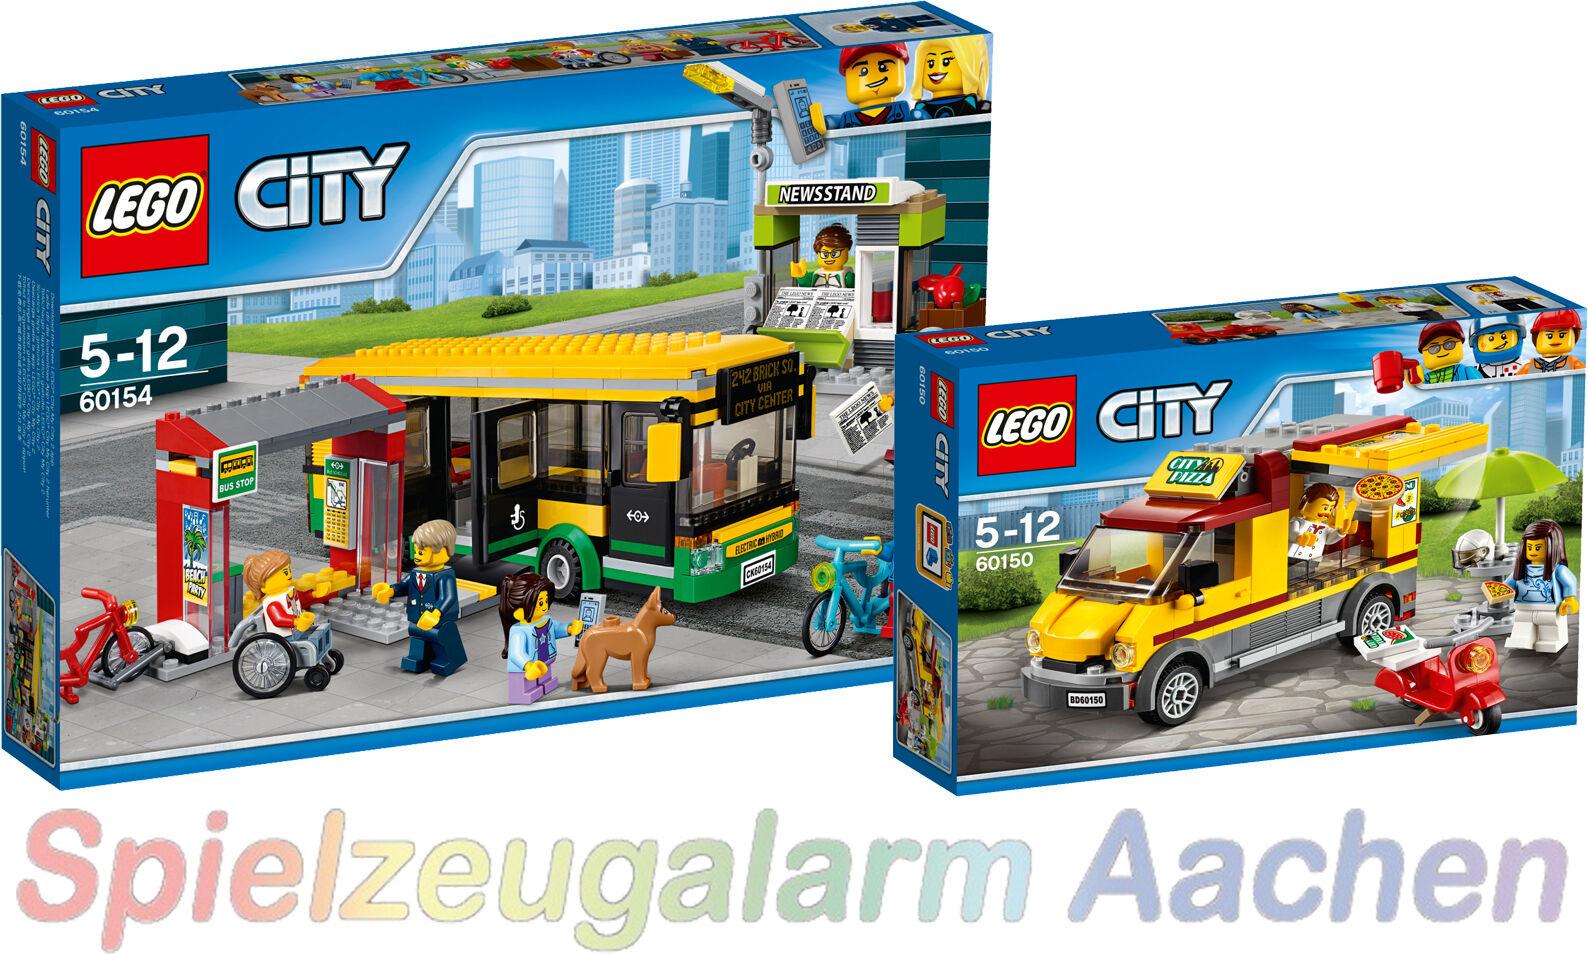 LEGO CITY Busbahnhof 60154 + 60150 Pizzawagen Central Bus Station N7/17